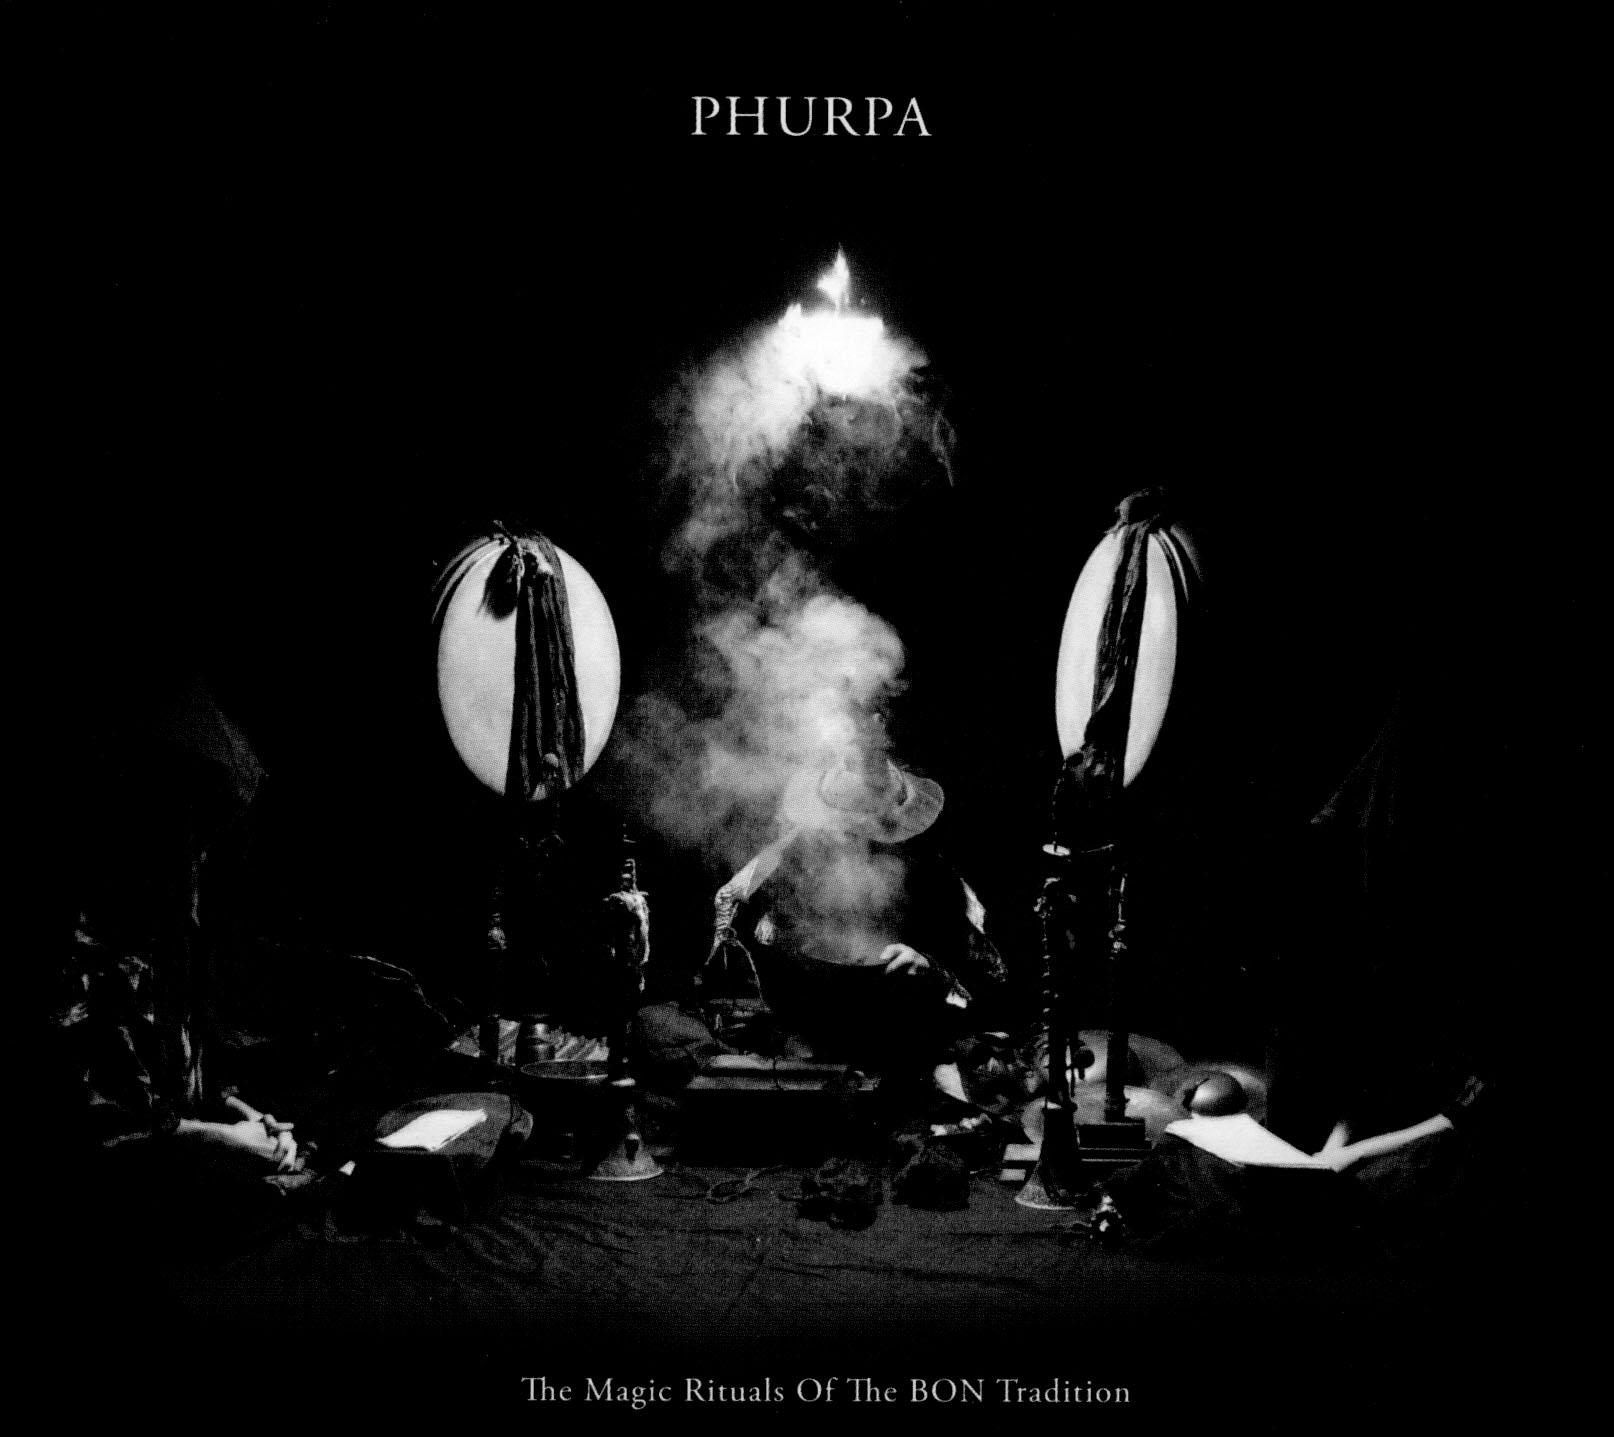 Phurpa: The Magic Rituals of the BON Tradition